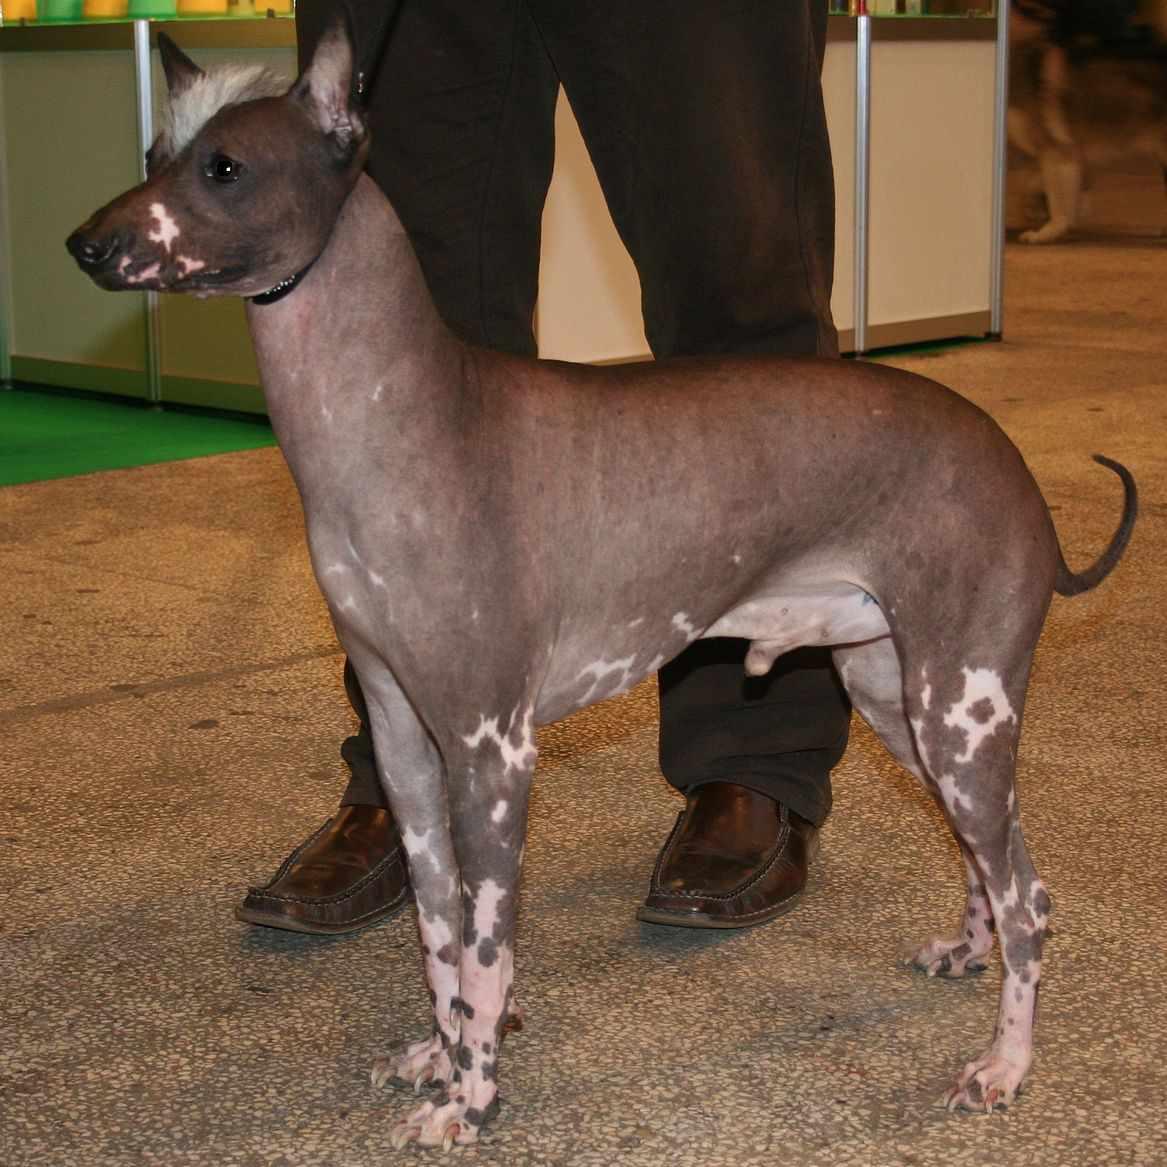 Hairless Khala dog standing